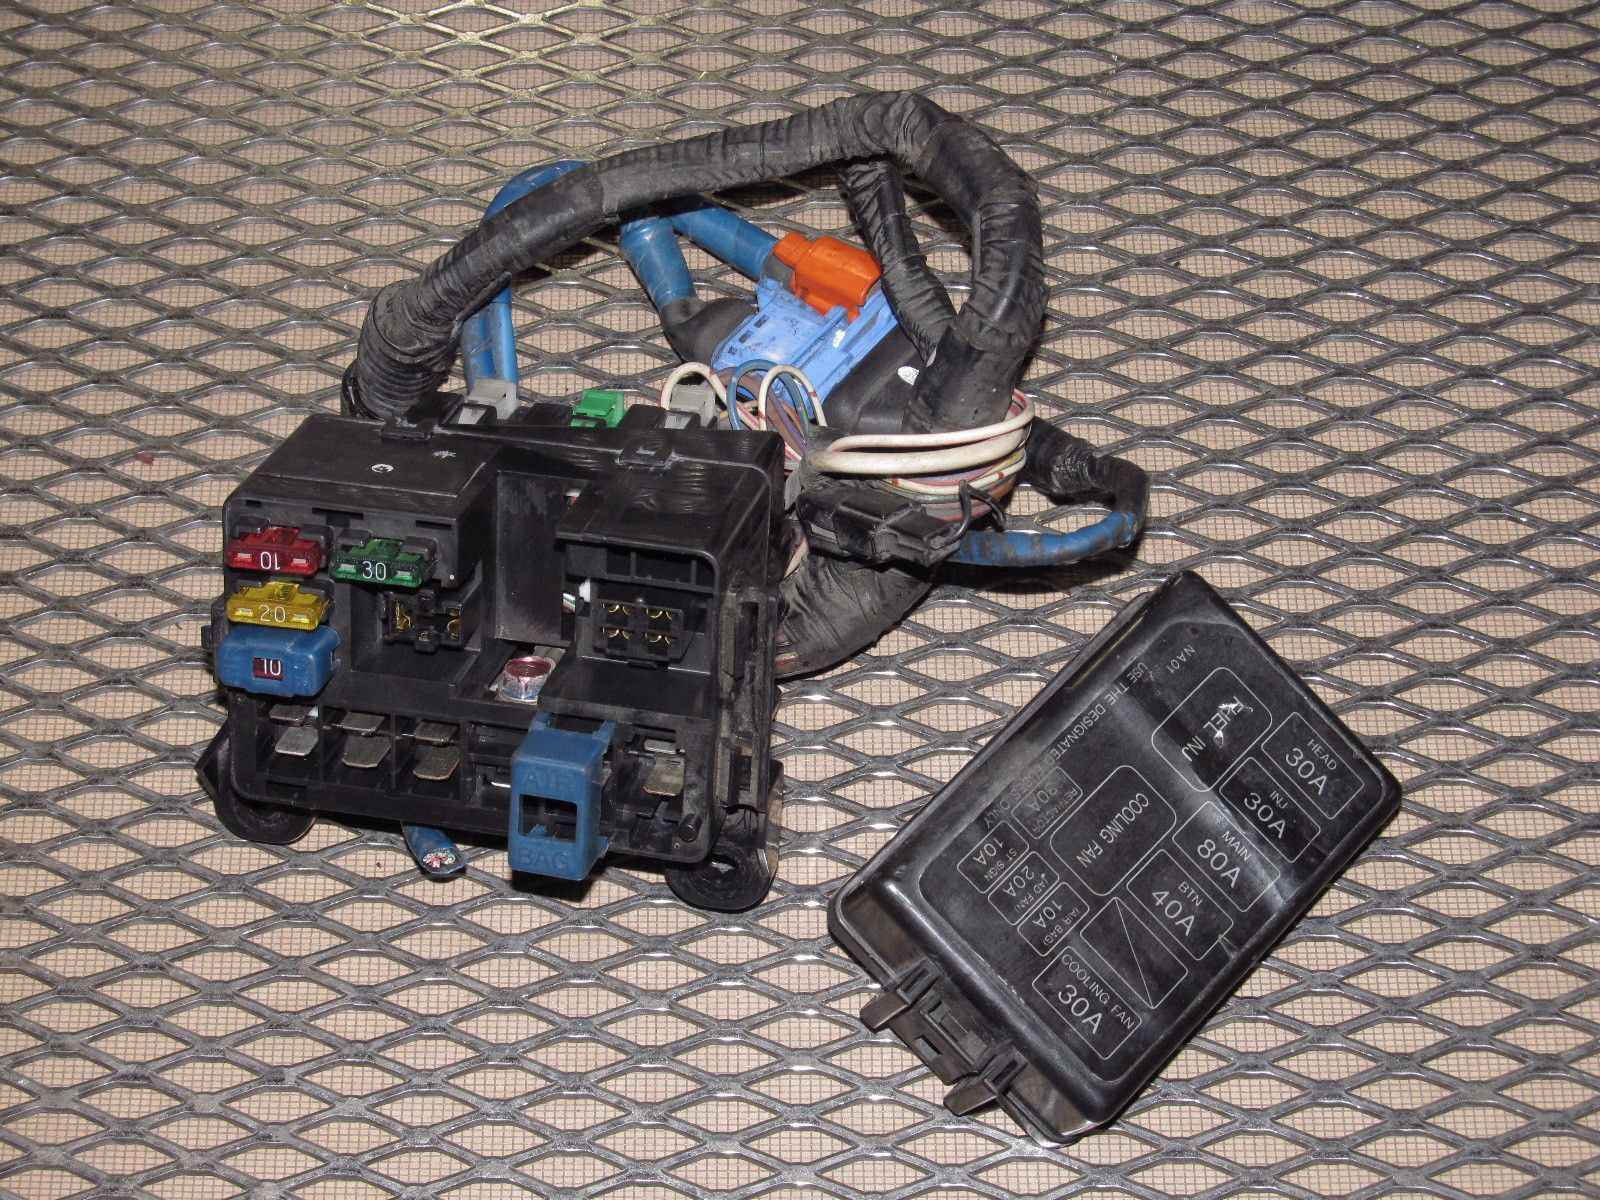 mazda eunos fuse box diagram wiring library90 91 92 93 mazda miata oem engine fuse box [ 1600 x 1200 Pixel ]